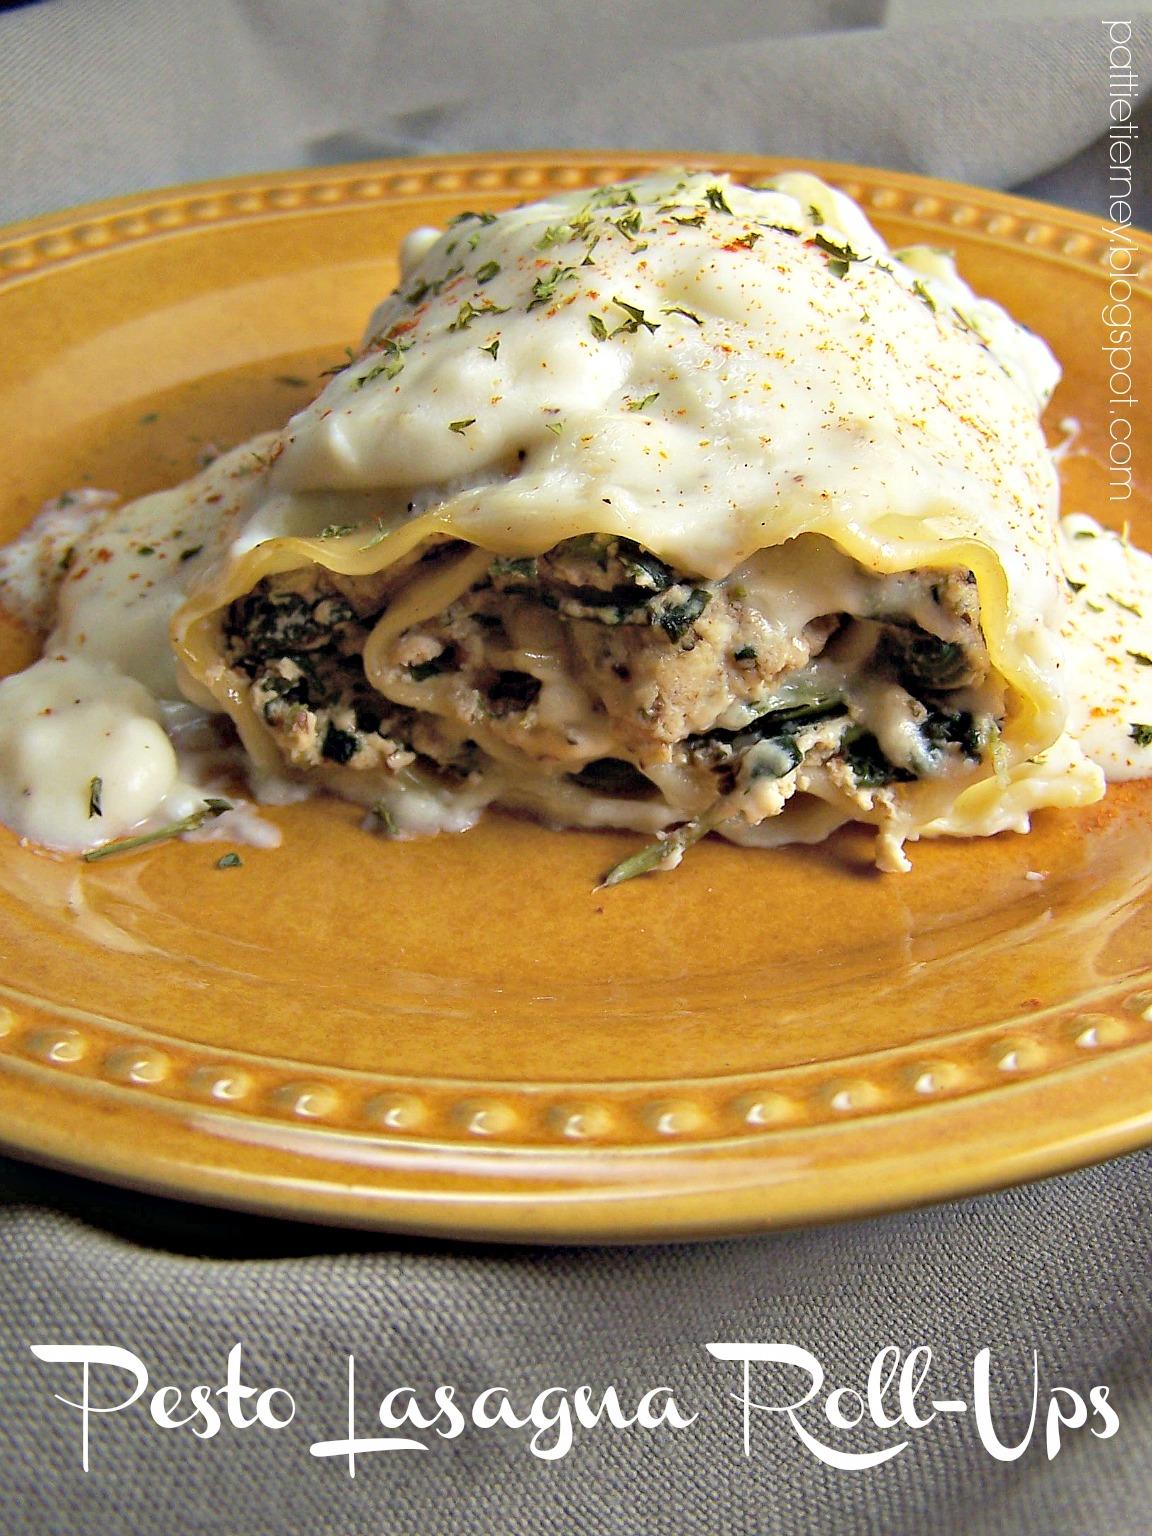 Pesto Lasagna Roll Ups